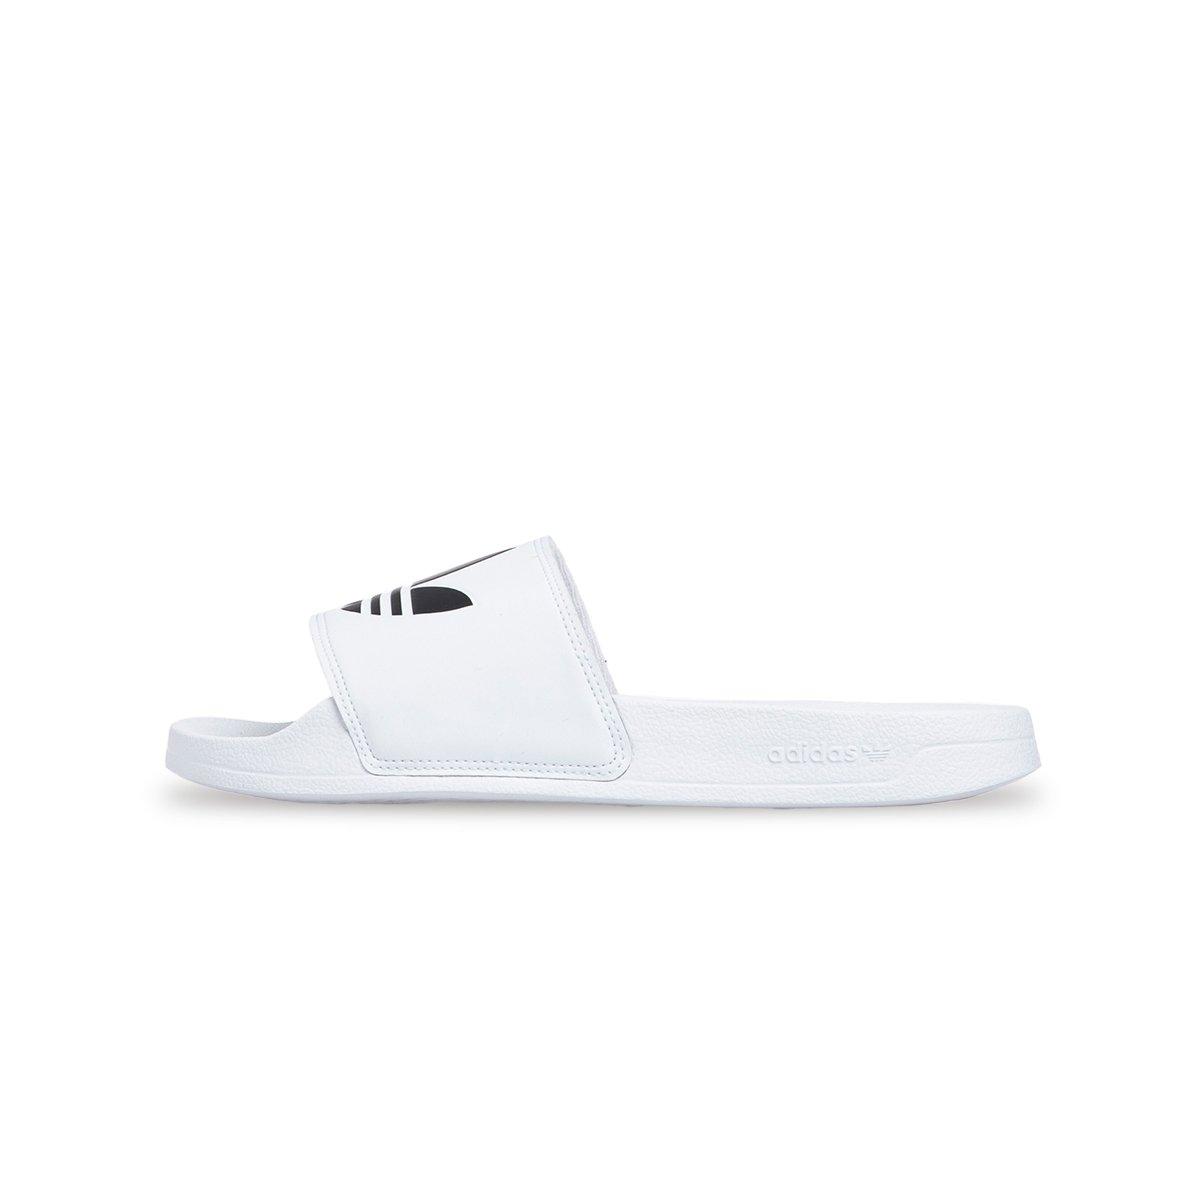 Klapki Adidas Originals Adilette Lite Slides białe (FU8297)